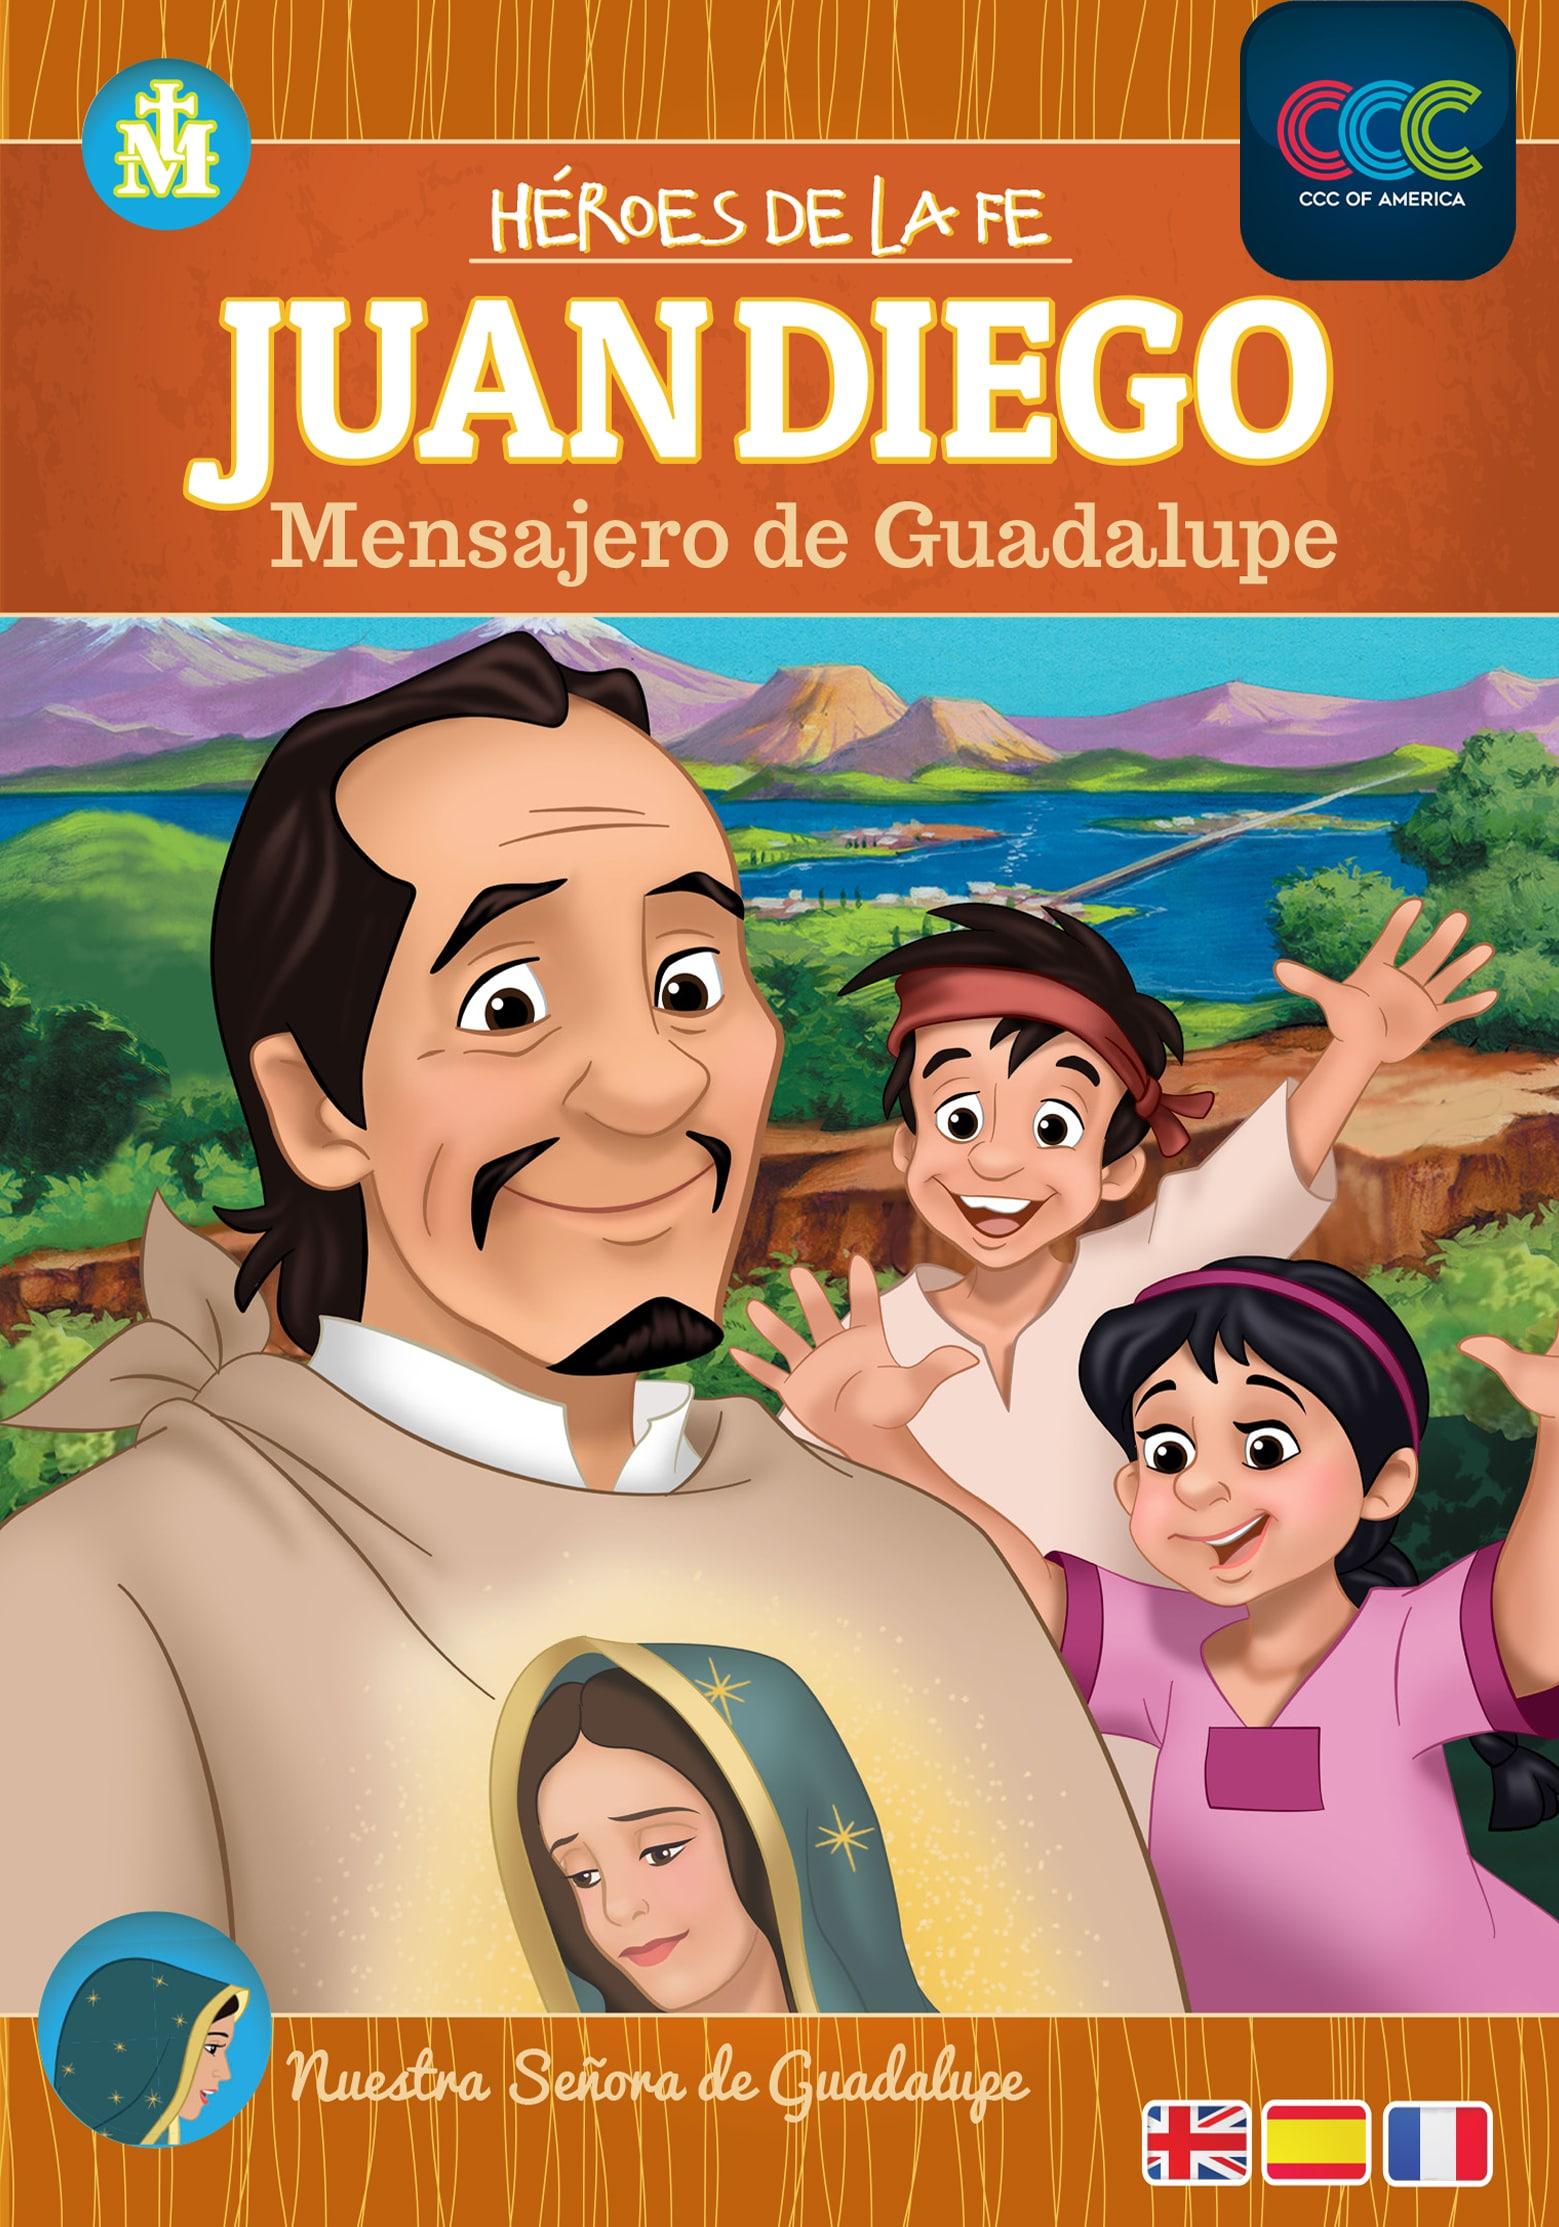 Juan Diego (Mensajero de Guadalupe)